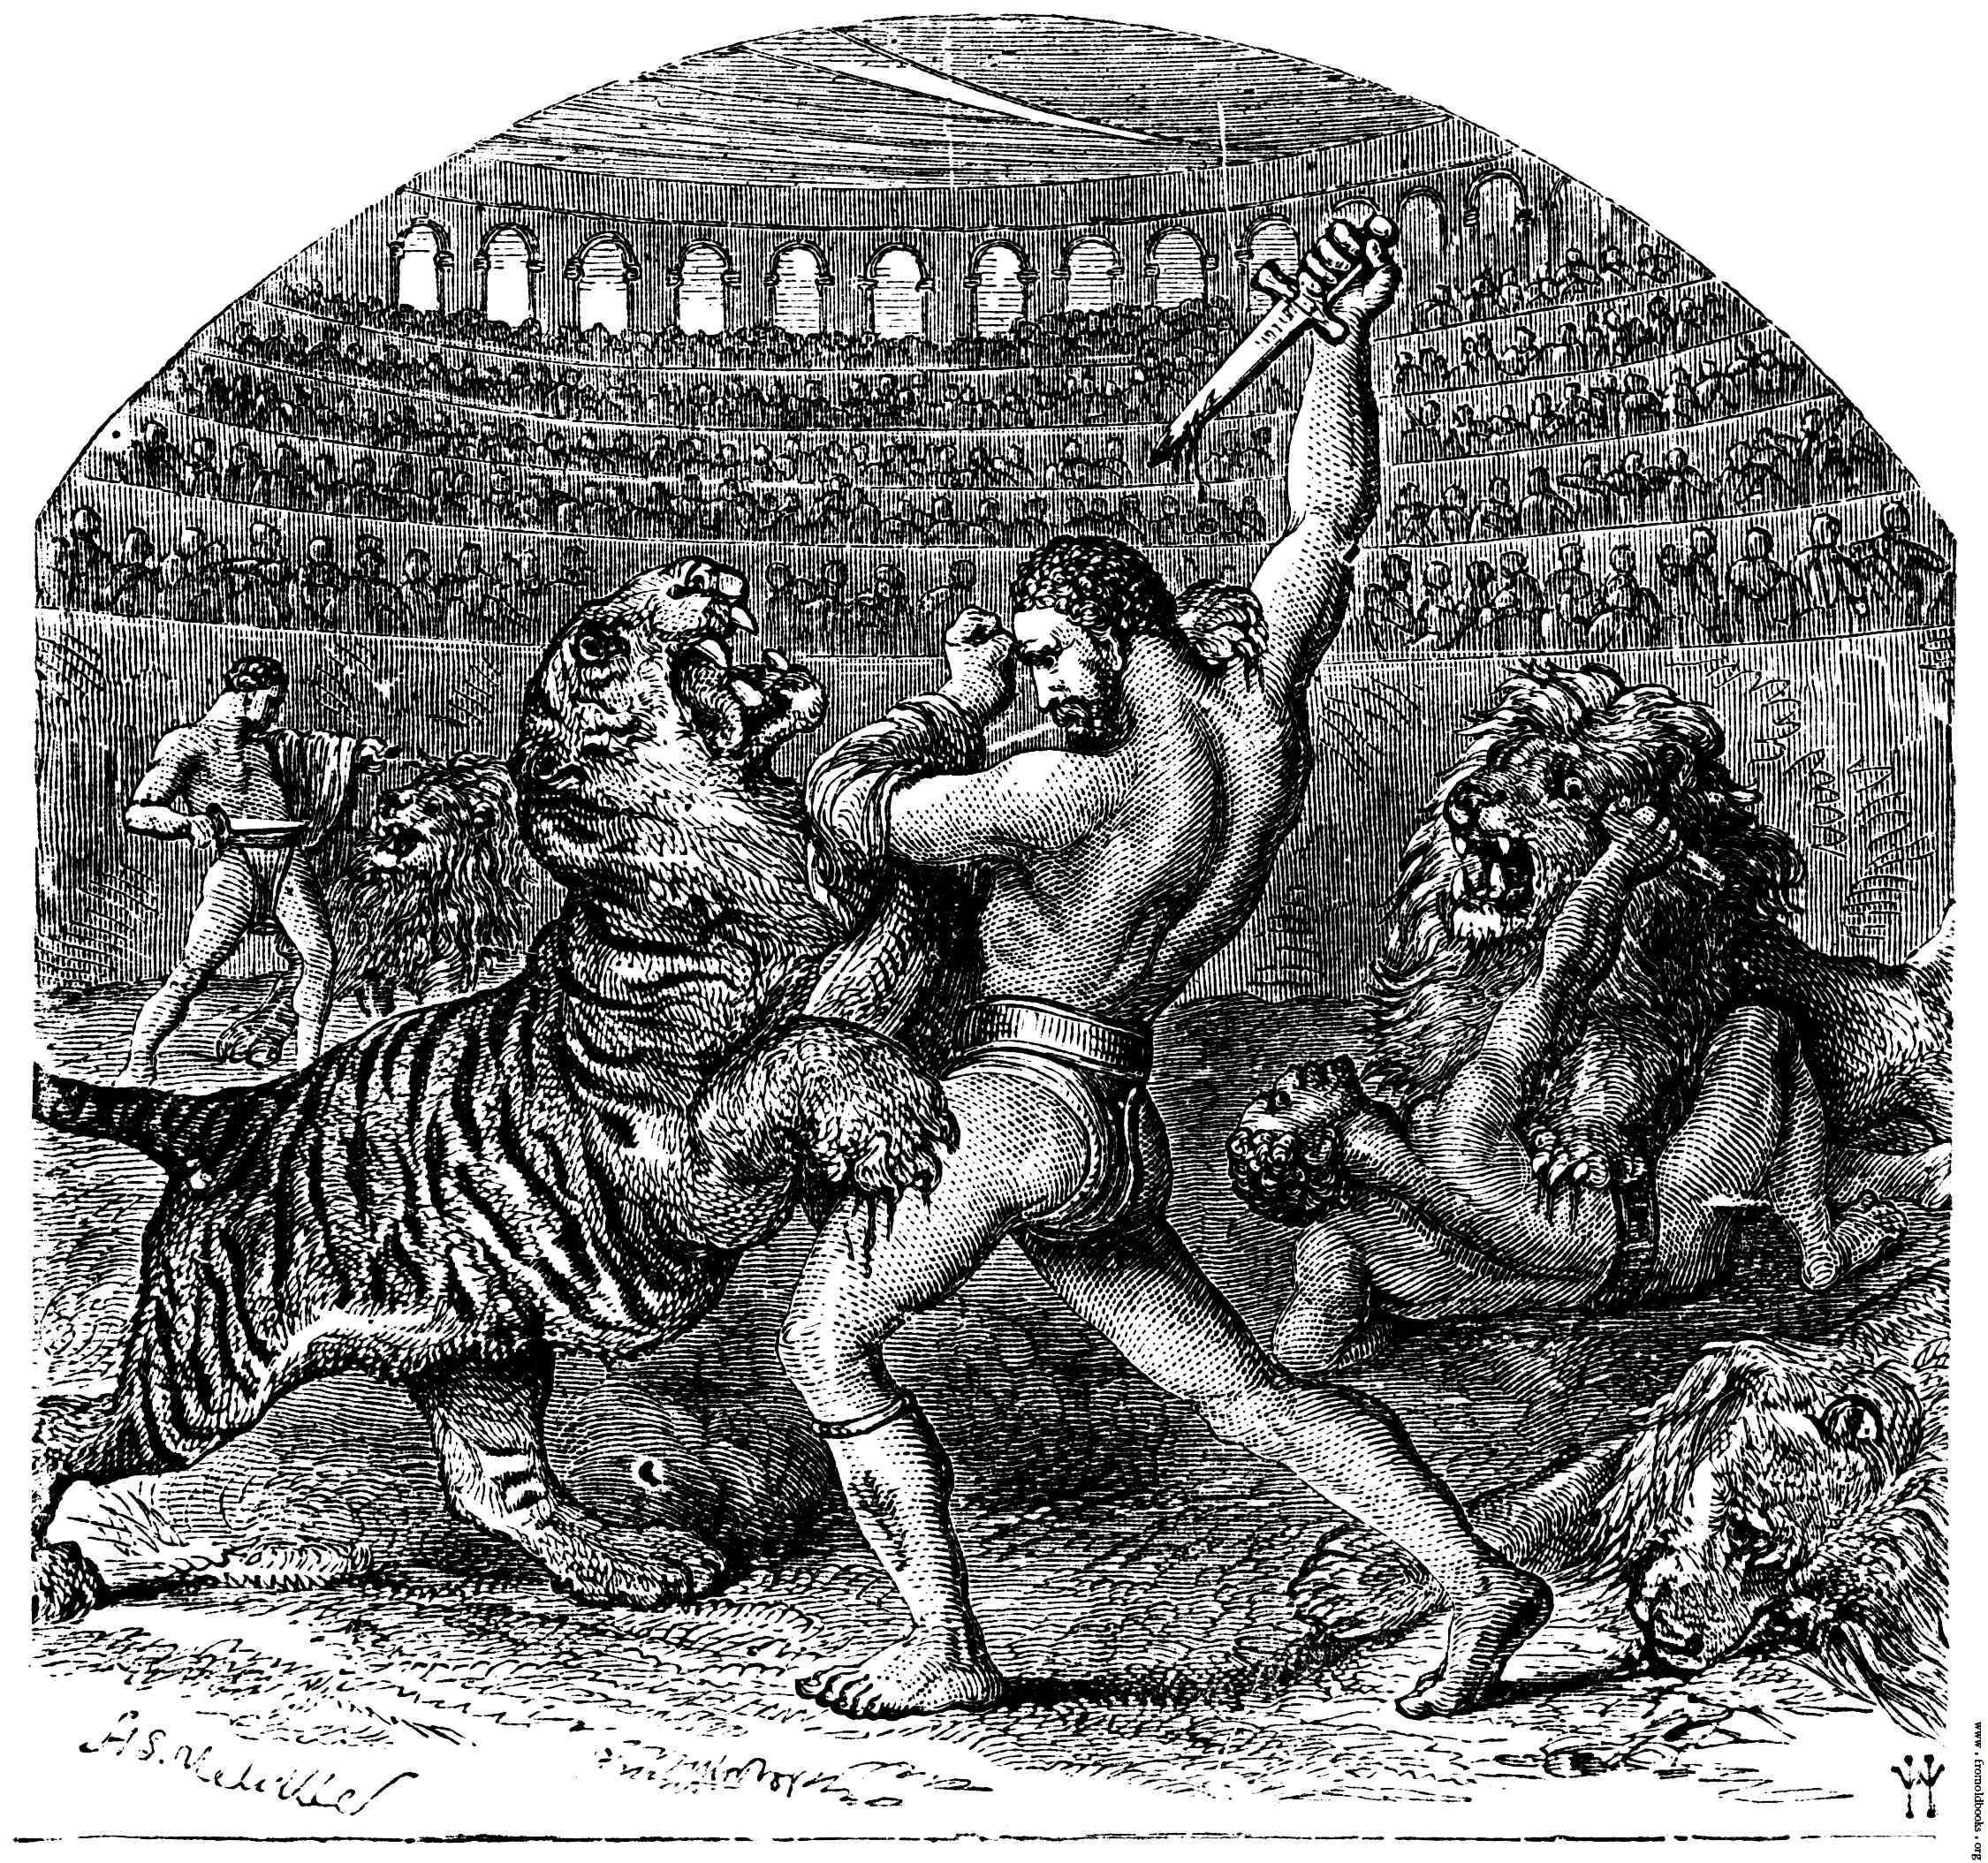 Gladiator Games By: Amada Hernandez.